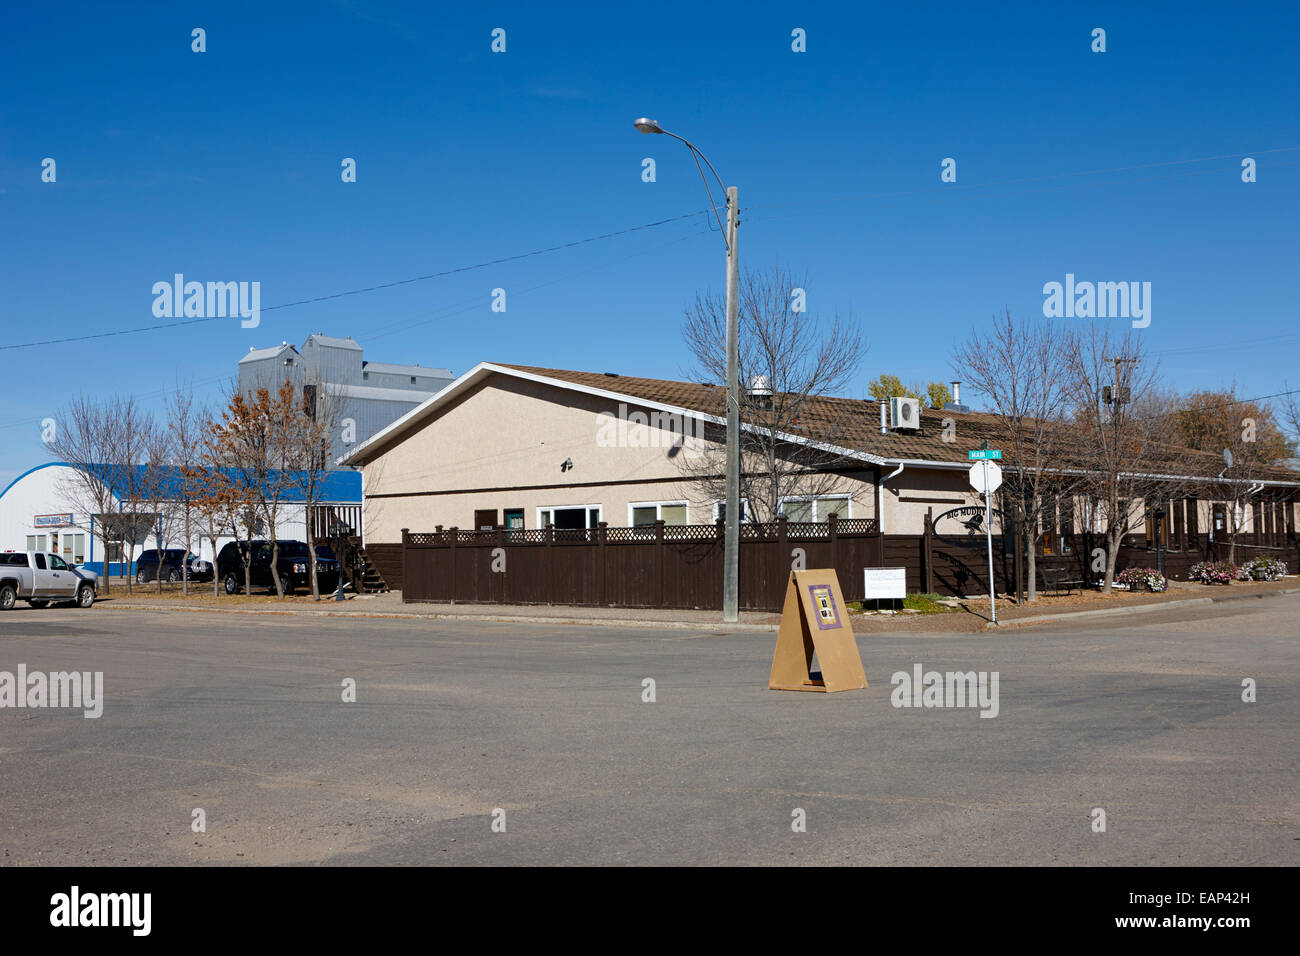 the big muddy inn in the centre of bengough Saskatchewan Canada - Stock Image